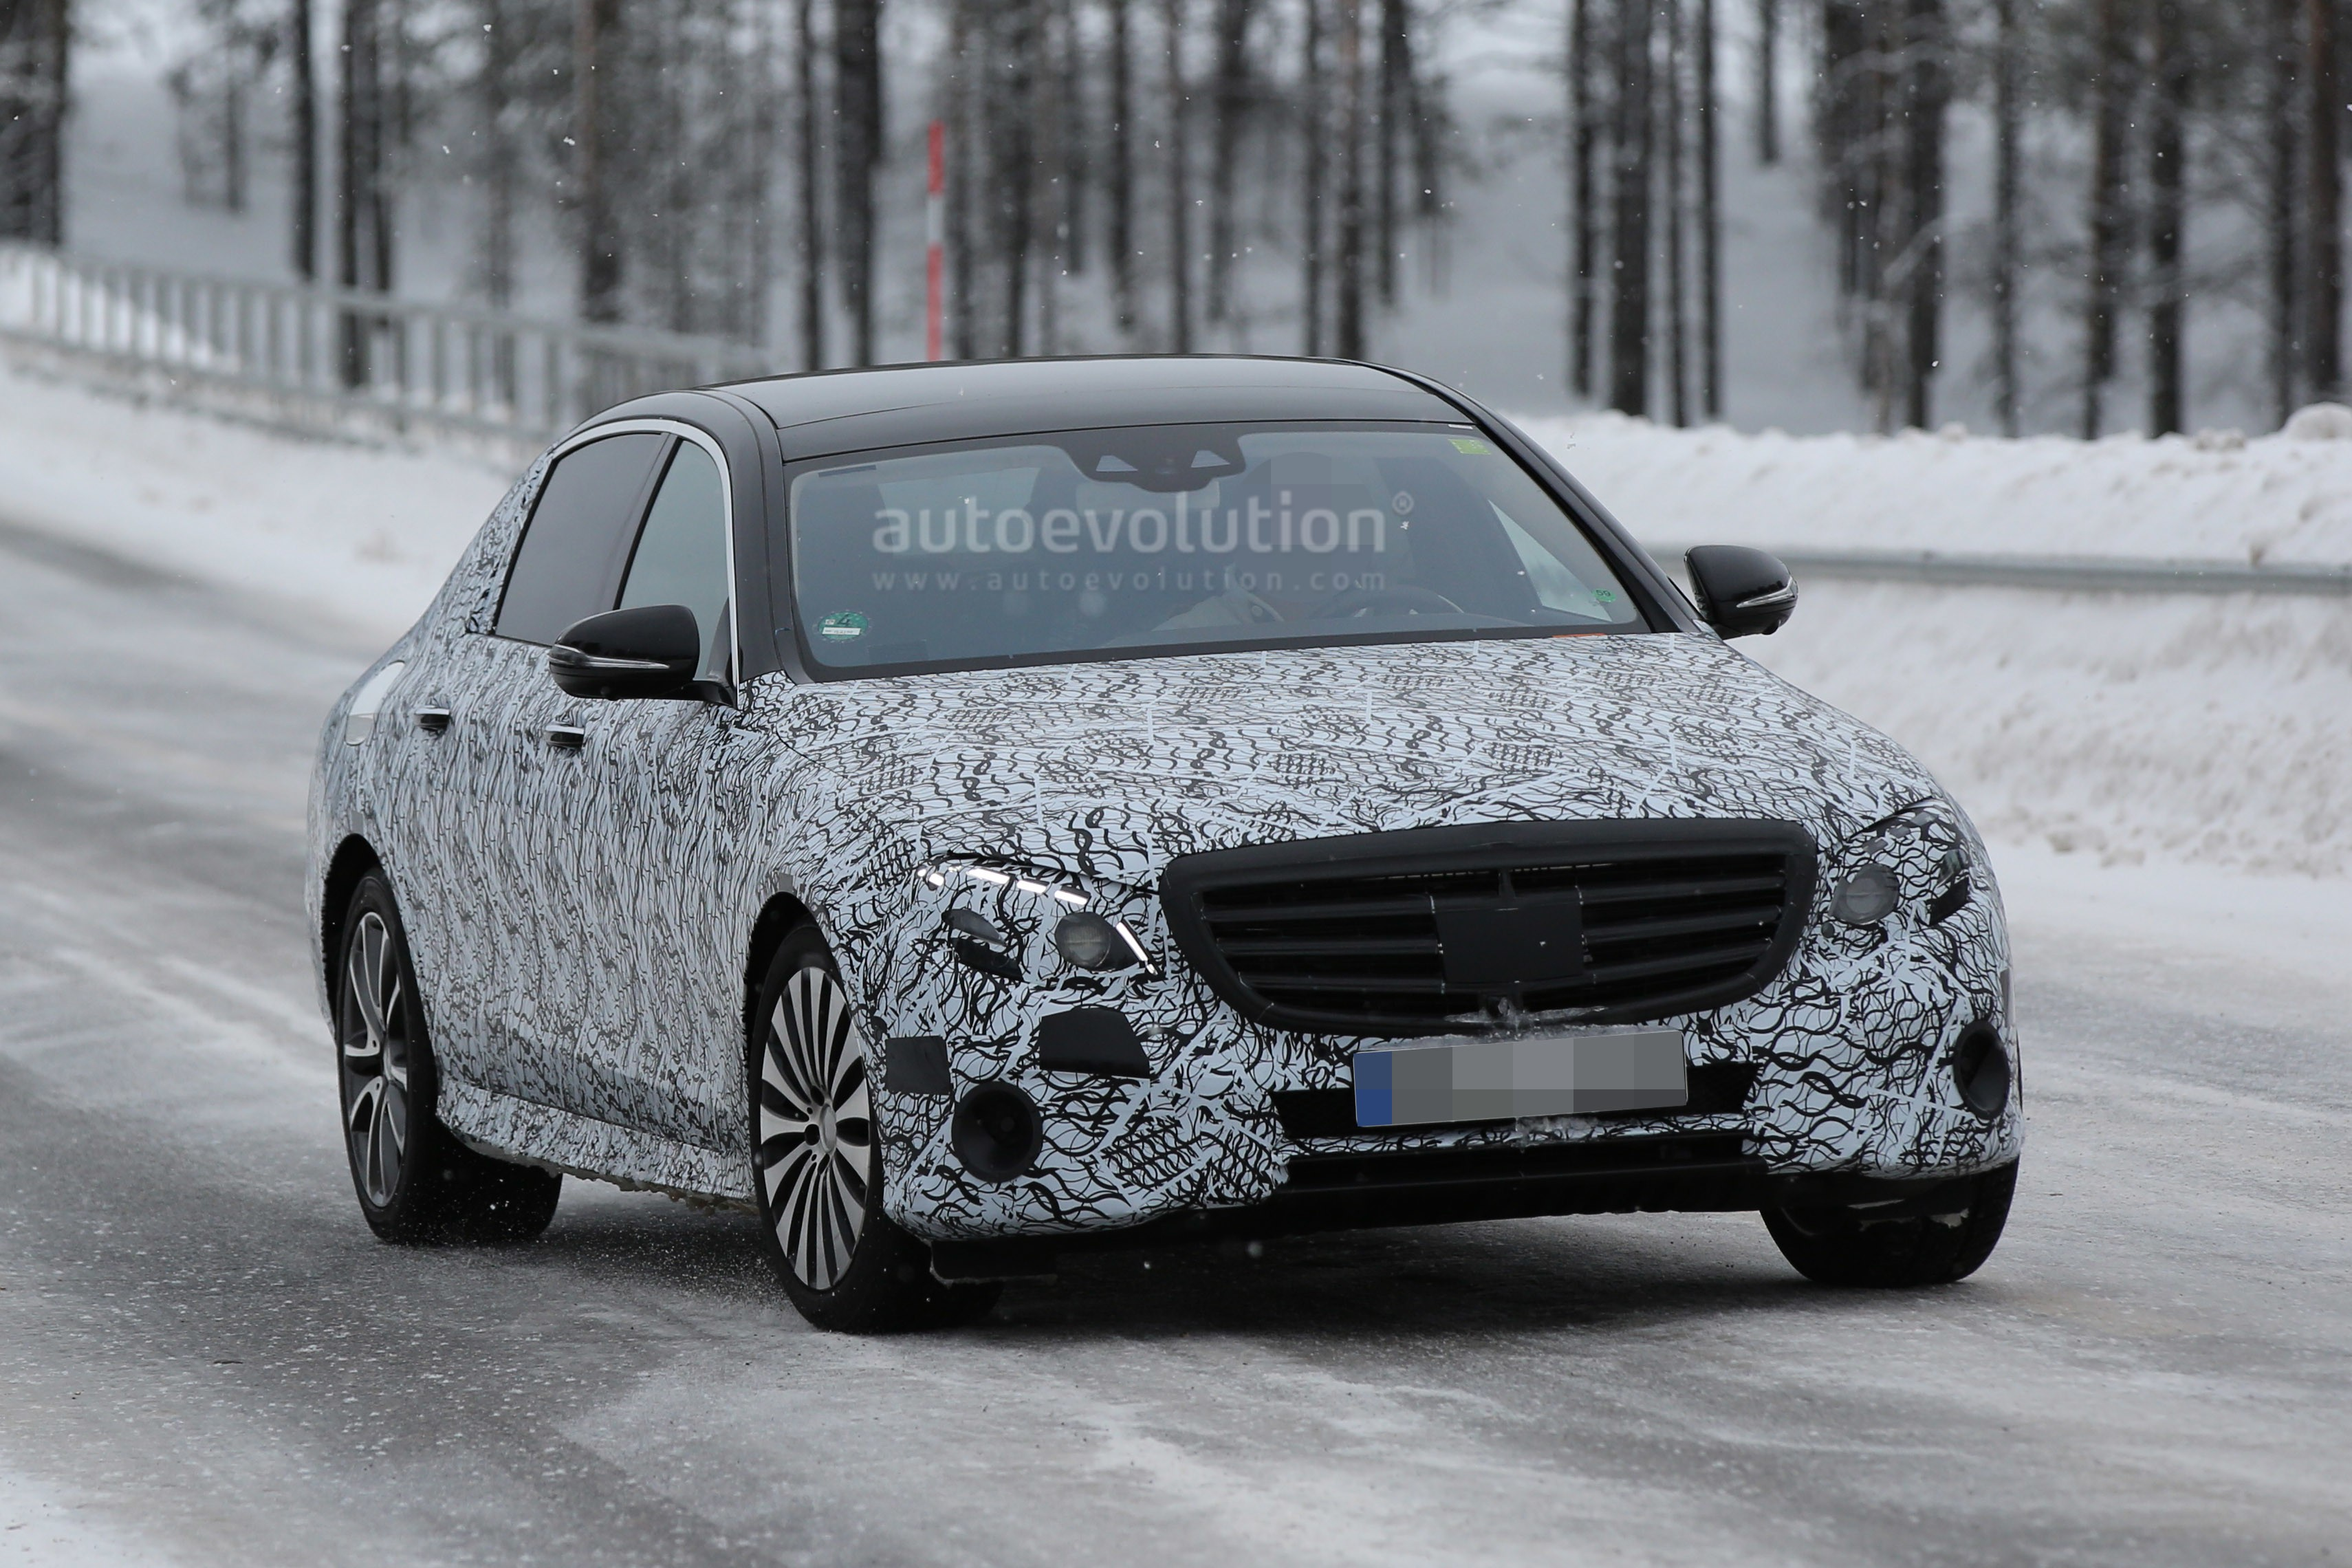 2018 Mercedes-Maybach E-Class Spied - autoevolution